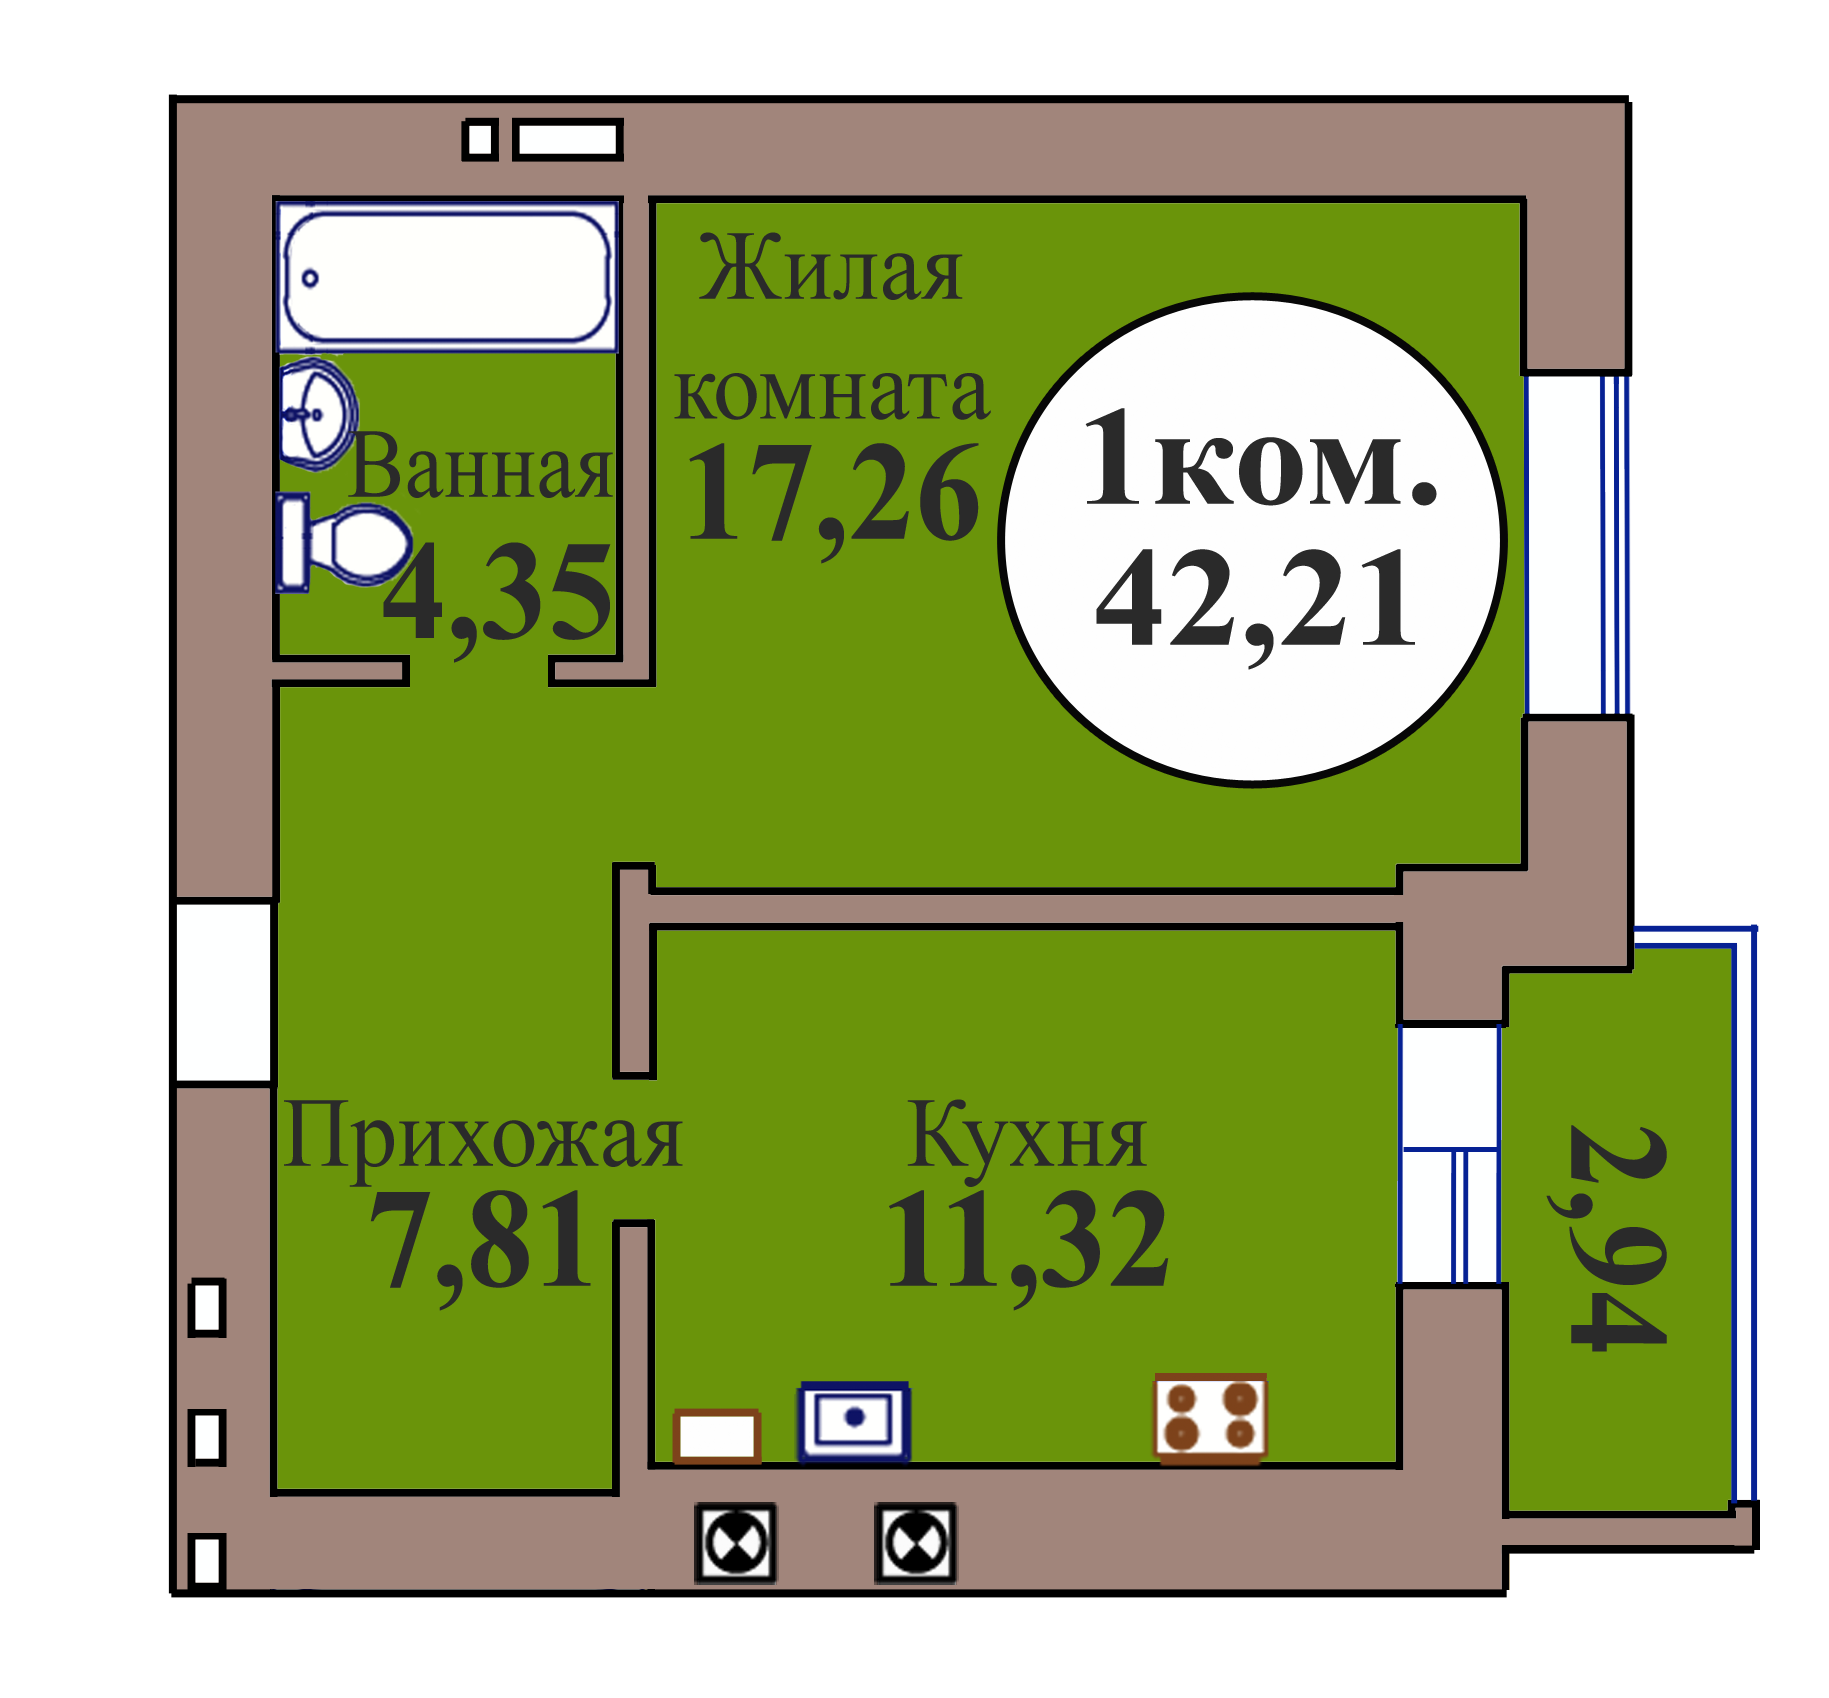 1-комн. кв. по пер. Калининградский, 5 кв. 153 в Калининграде